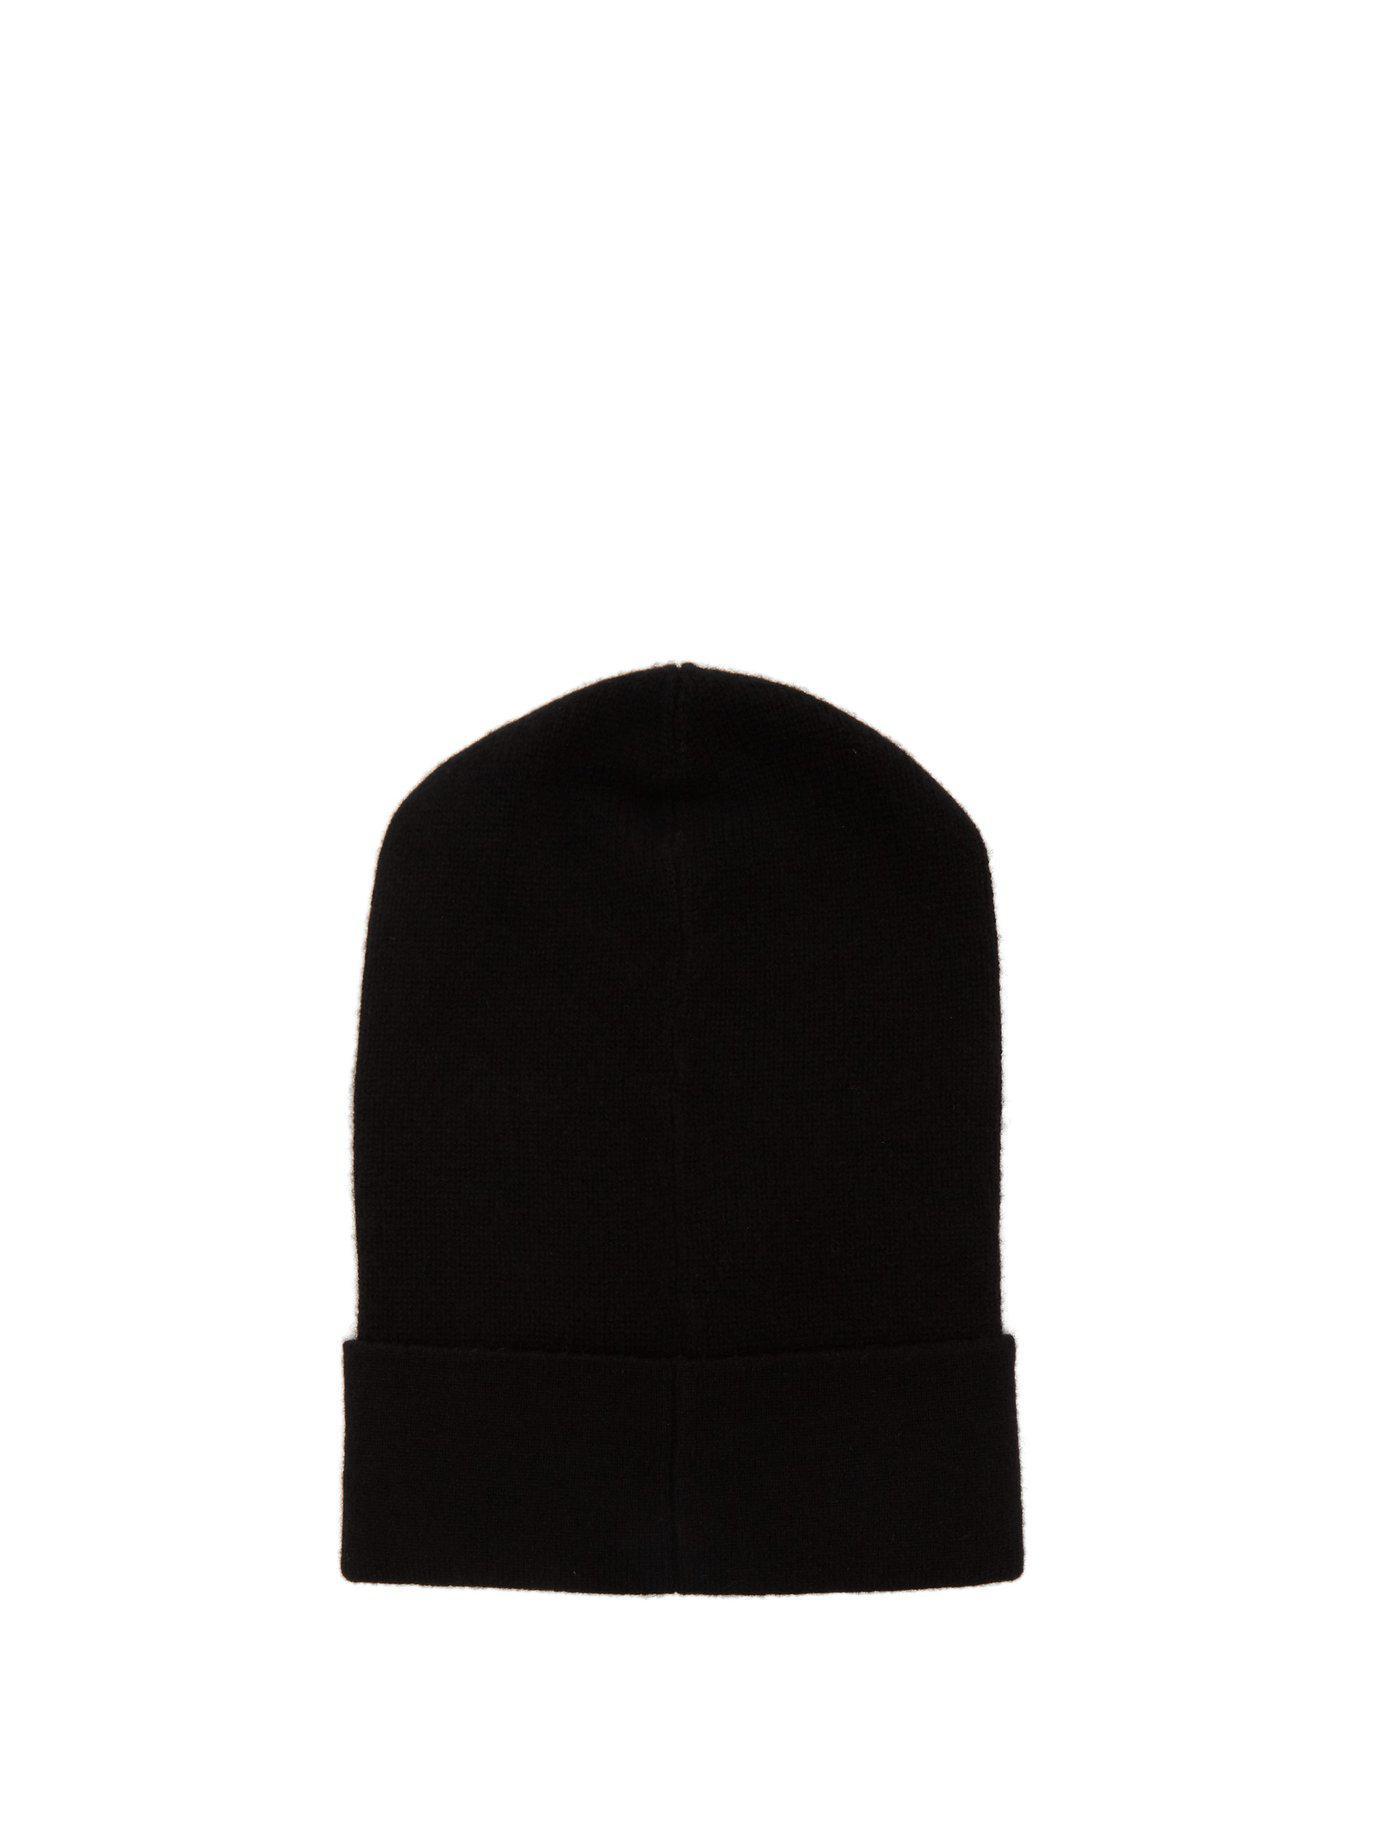 8eb51319c54 Lyst - Moncler Logo Cashmere Beanie Hat in Black